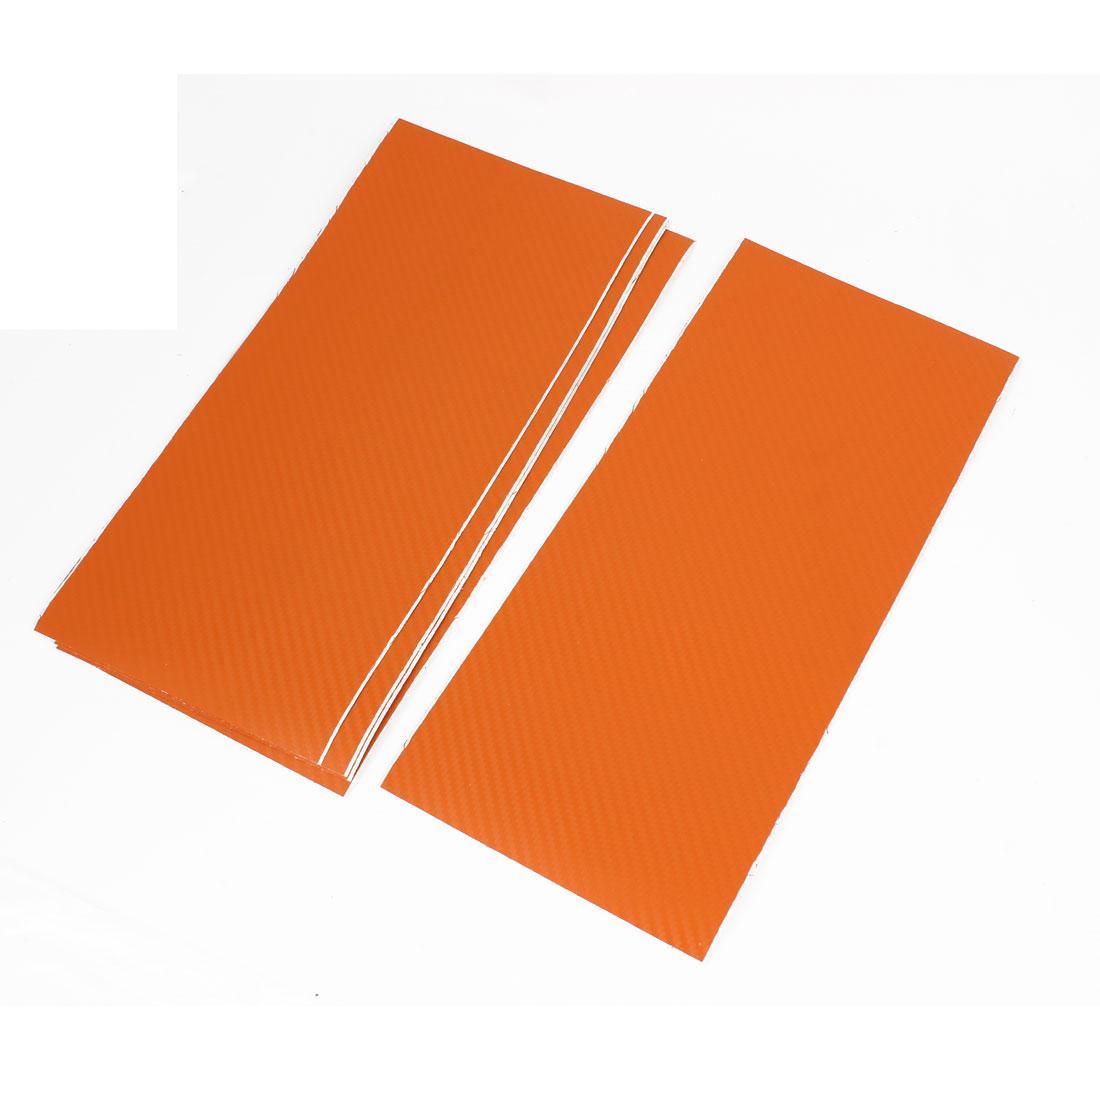 5pcs 300 x 133mm Adhesive Back Carbon Fiber Printed Vinyl Protective Film Sticker Orange for Car